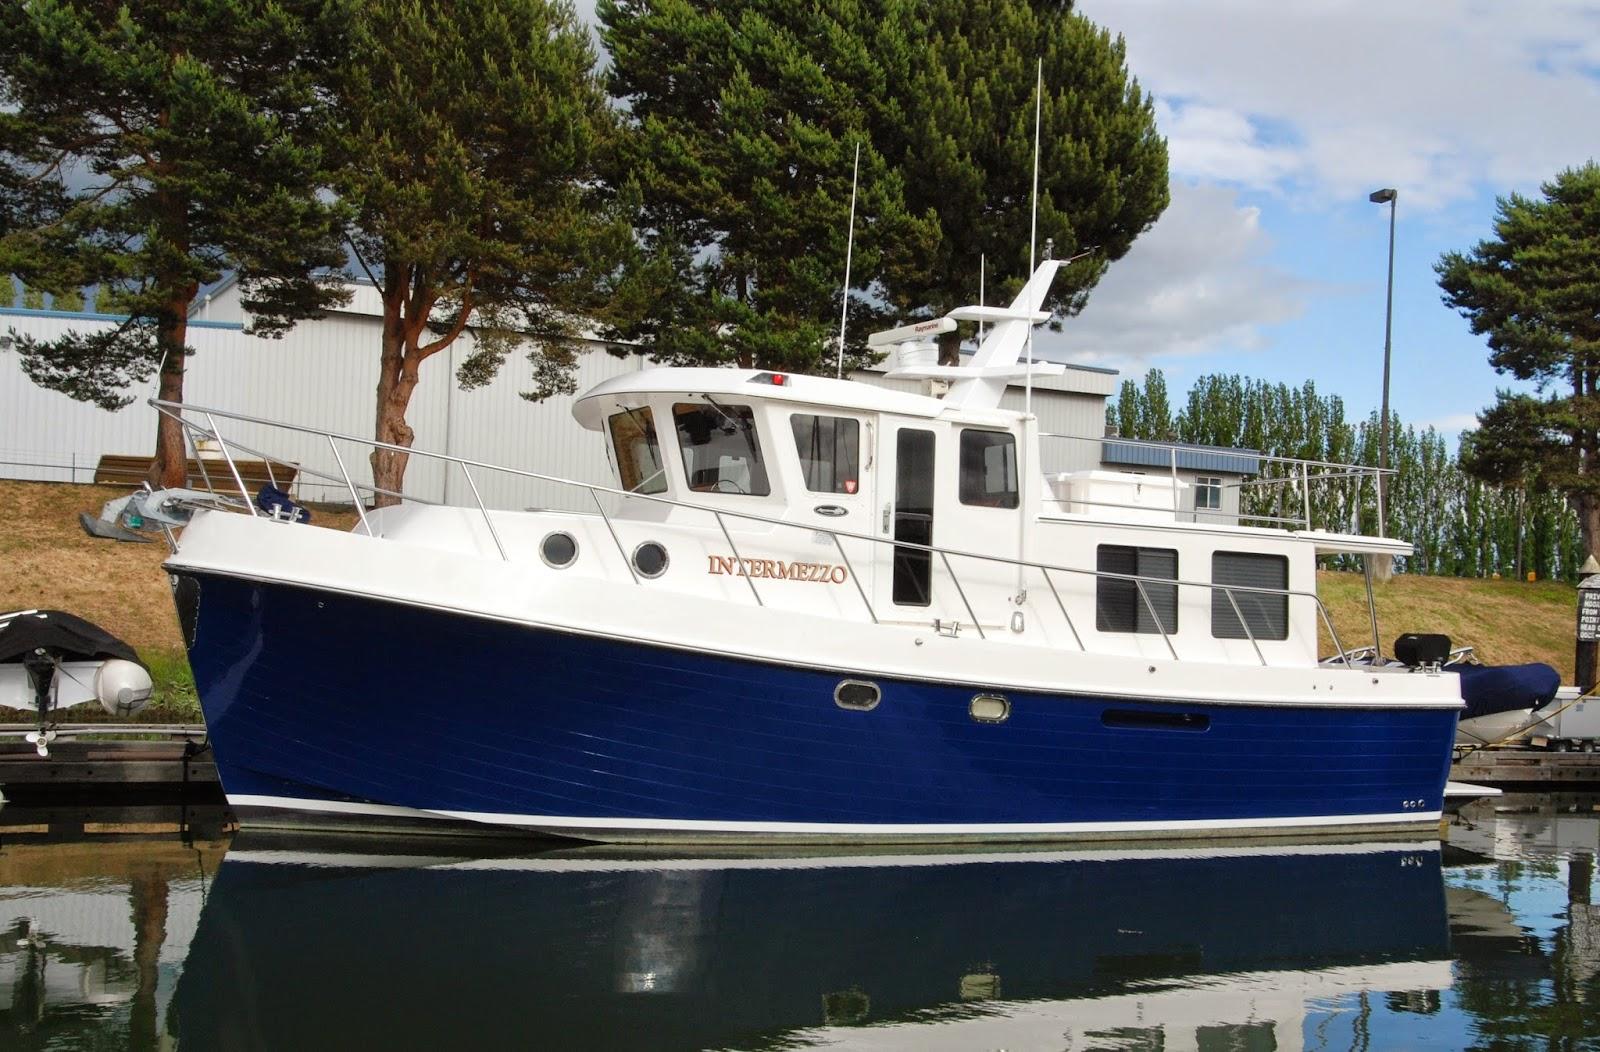 http://www.yachtworld.com/core/listing/pl_boat_detail.jsp?&units=Feet&id=2734708&lang=en&slim=broker&&hosturl=americantugsandtrawlers&&ywo=americantugsandtrawlers&